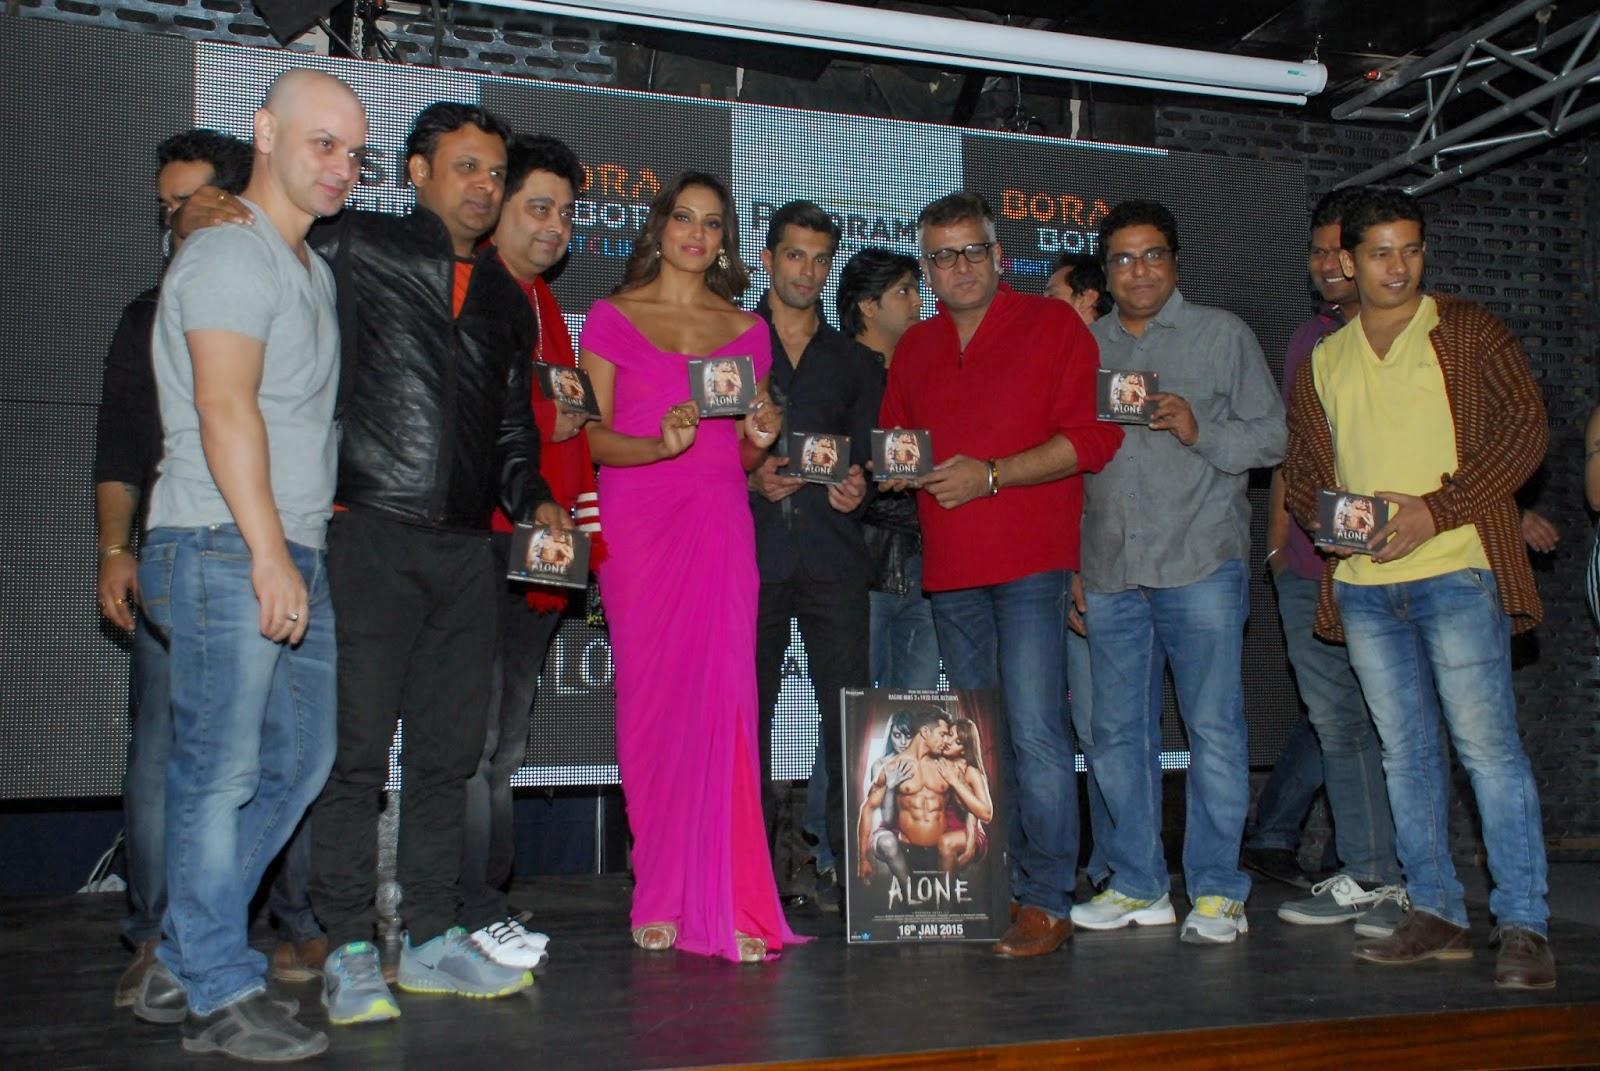 Bipasha Basu Cleavage Show in Alone Movie Music Launch